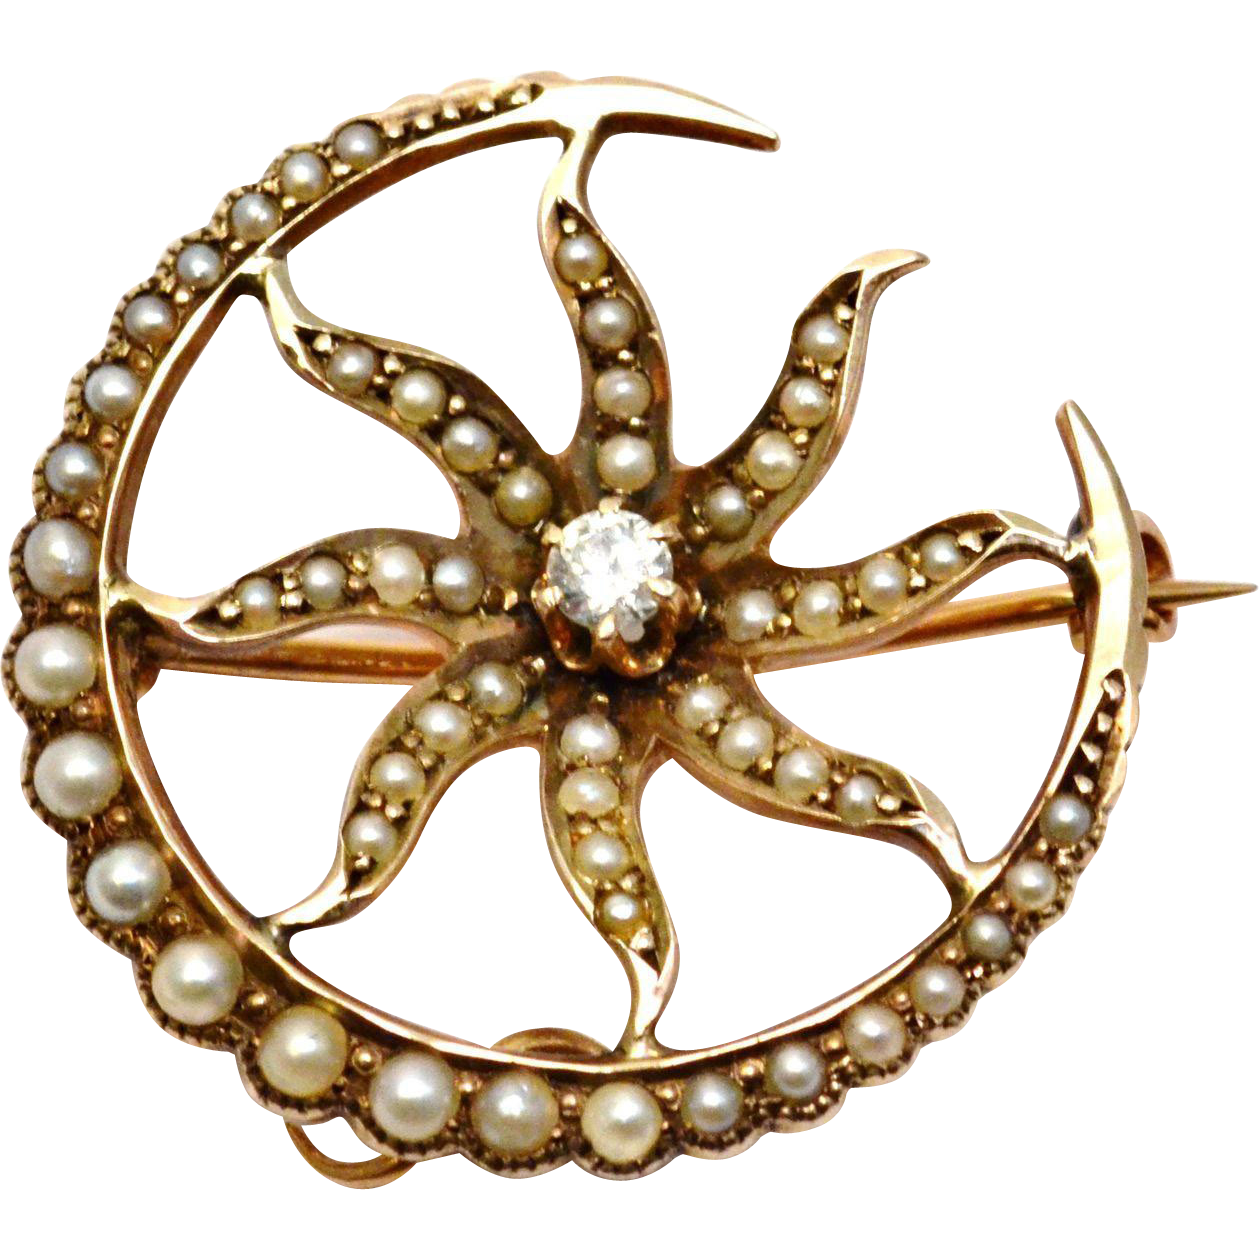 Antique Victorian 14k gold seed pearl diamond crescent moon sunburst watch pin brooch